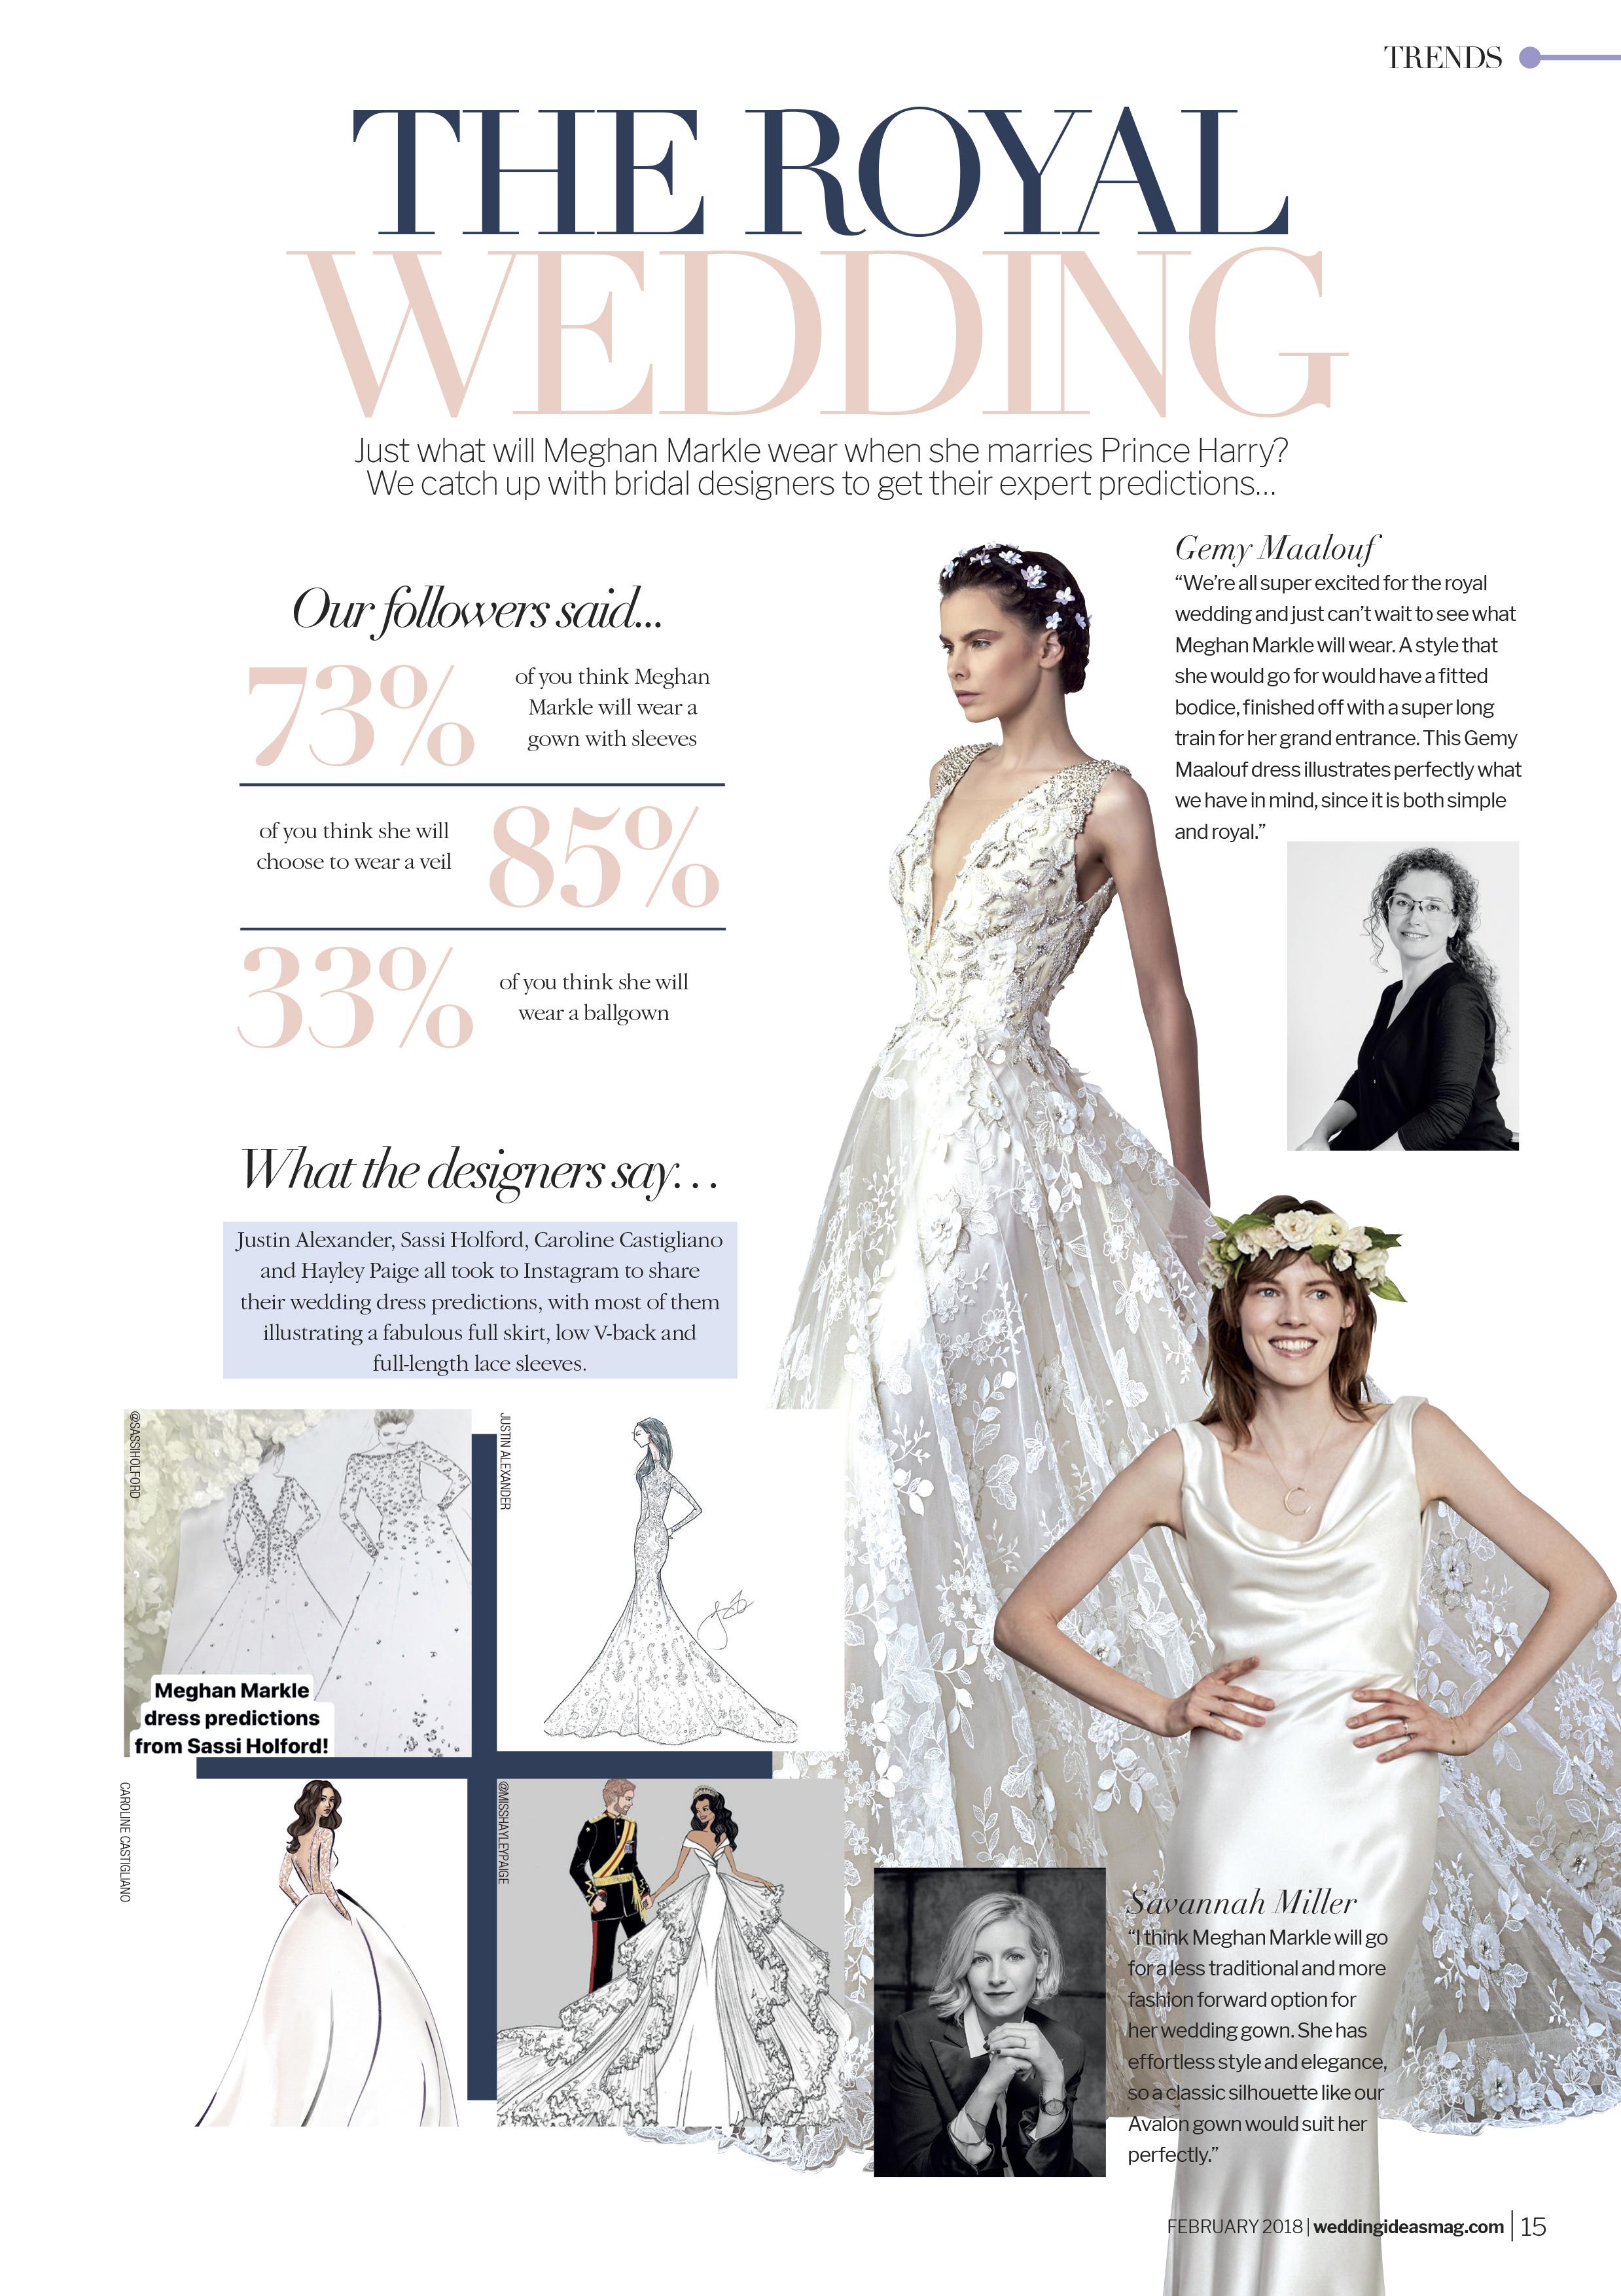 Meghan Markle designer wedding dress by Caroline Castigliano